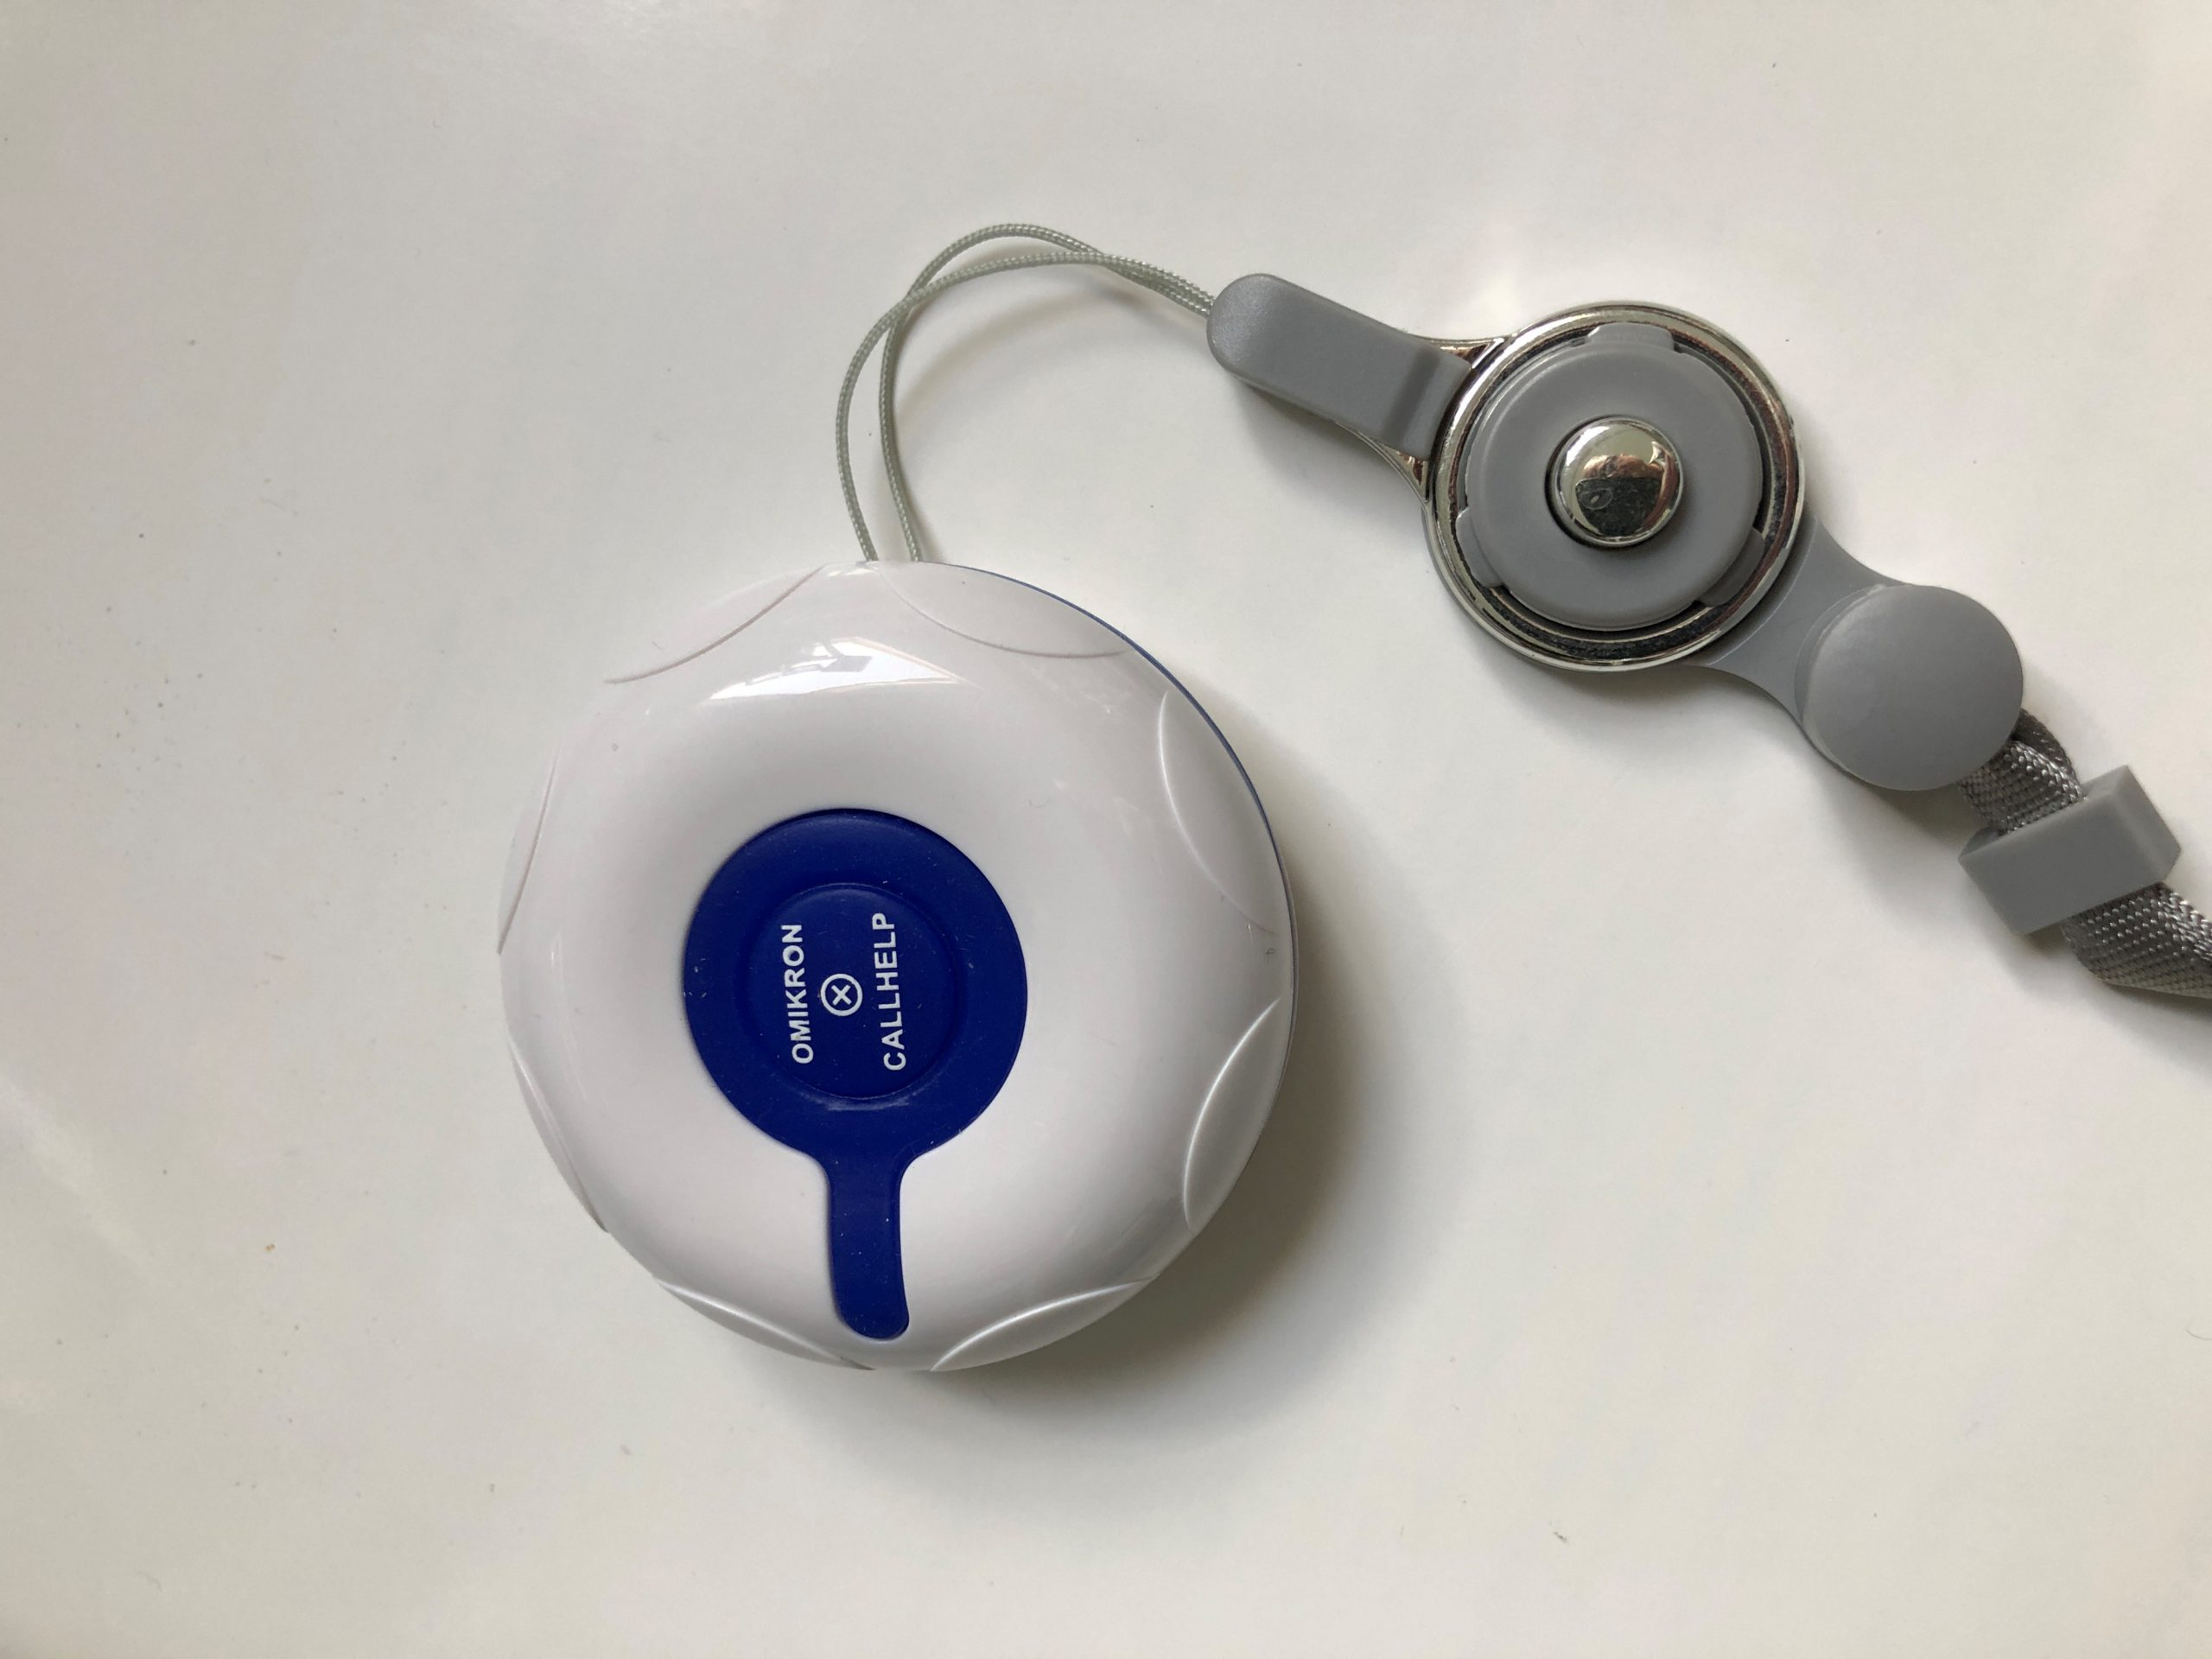 alarmknop alarmnoodknop alarmeringknop alarmeringsknop alarmoproep alarmoproepknop noodalarm noodalarmering agressie alarm knop